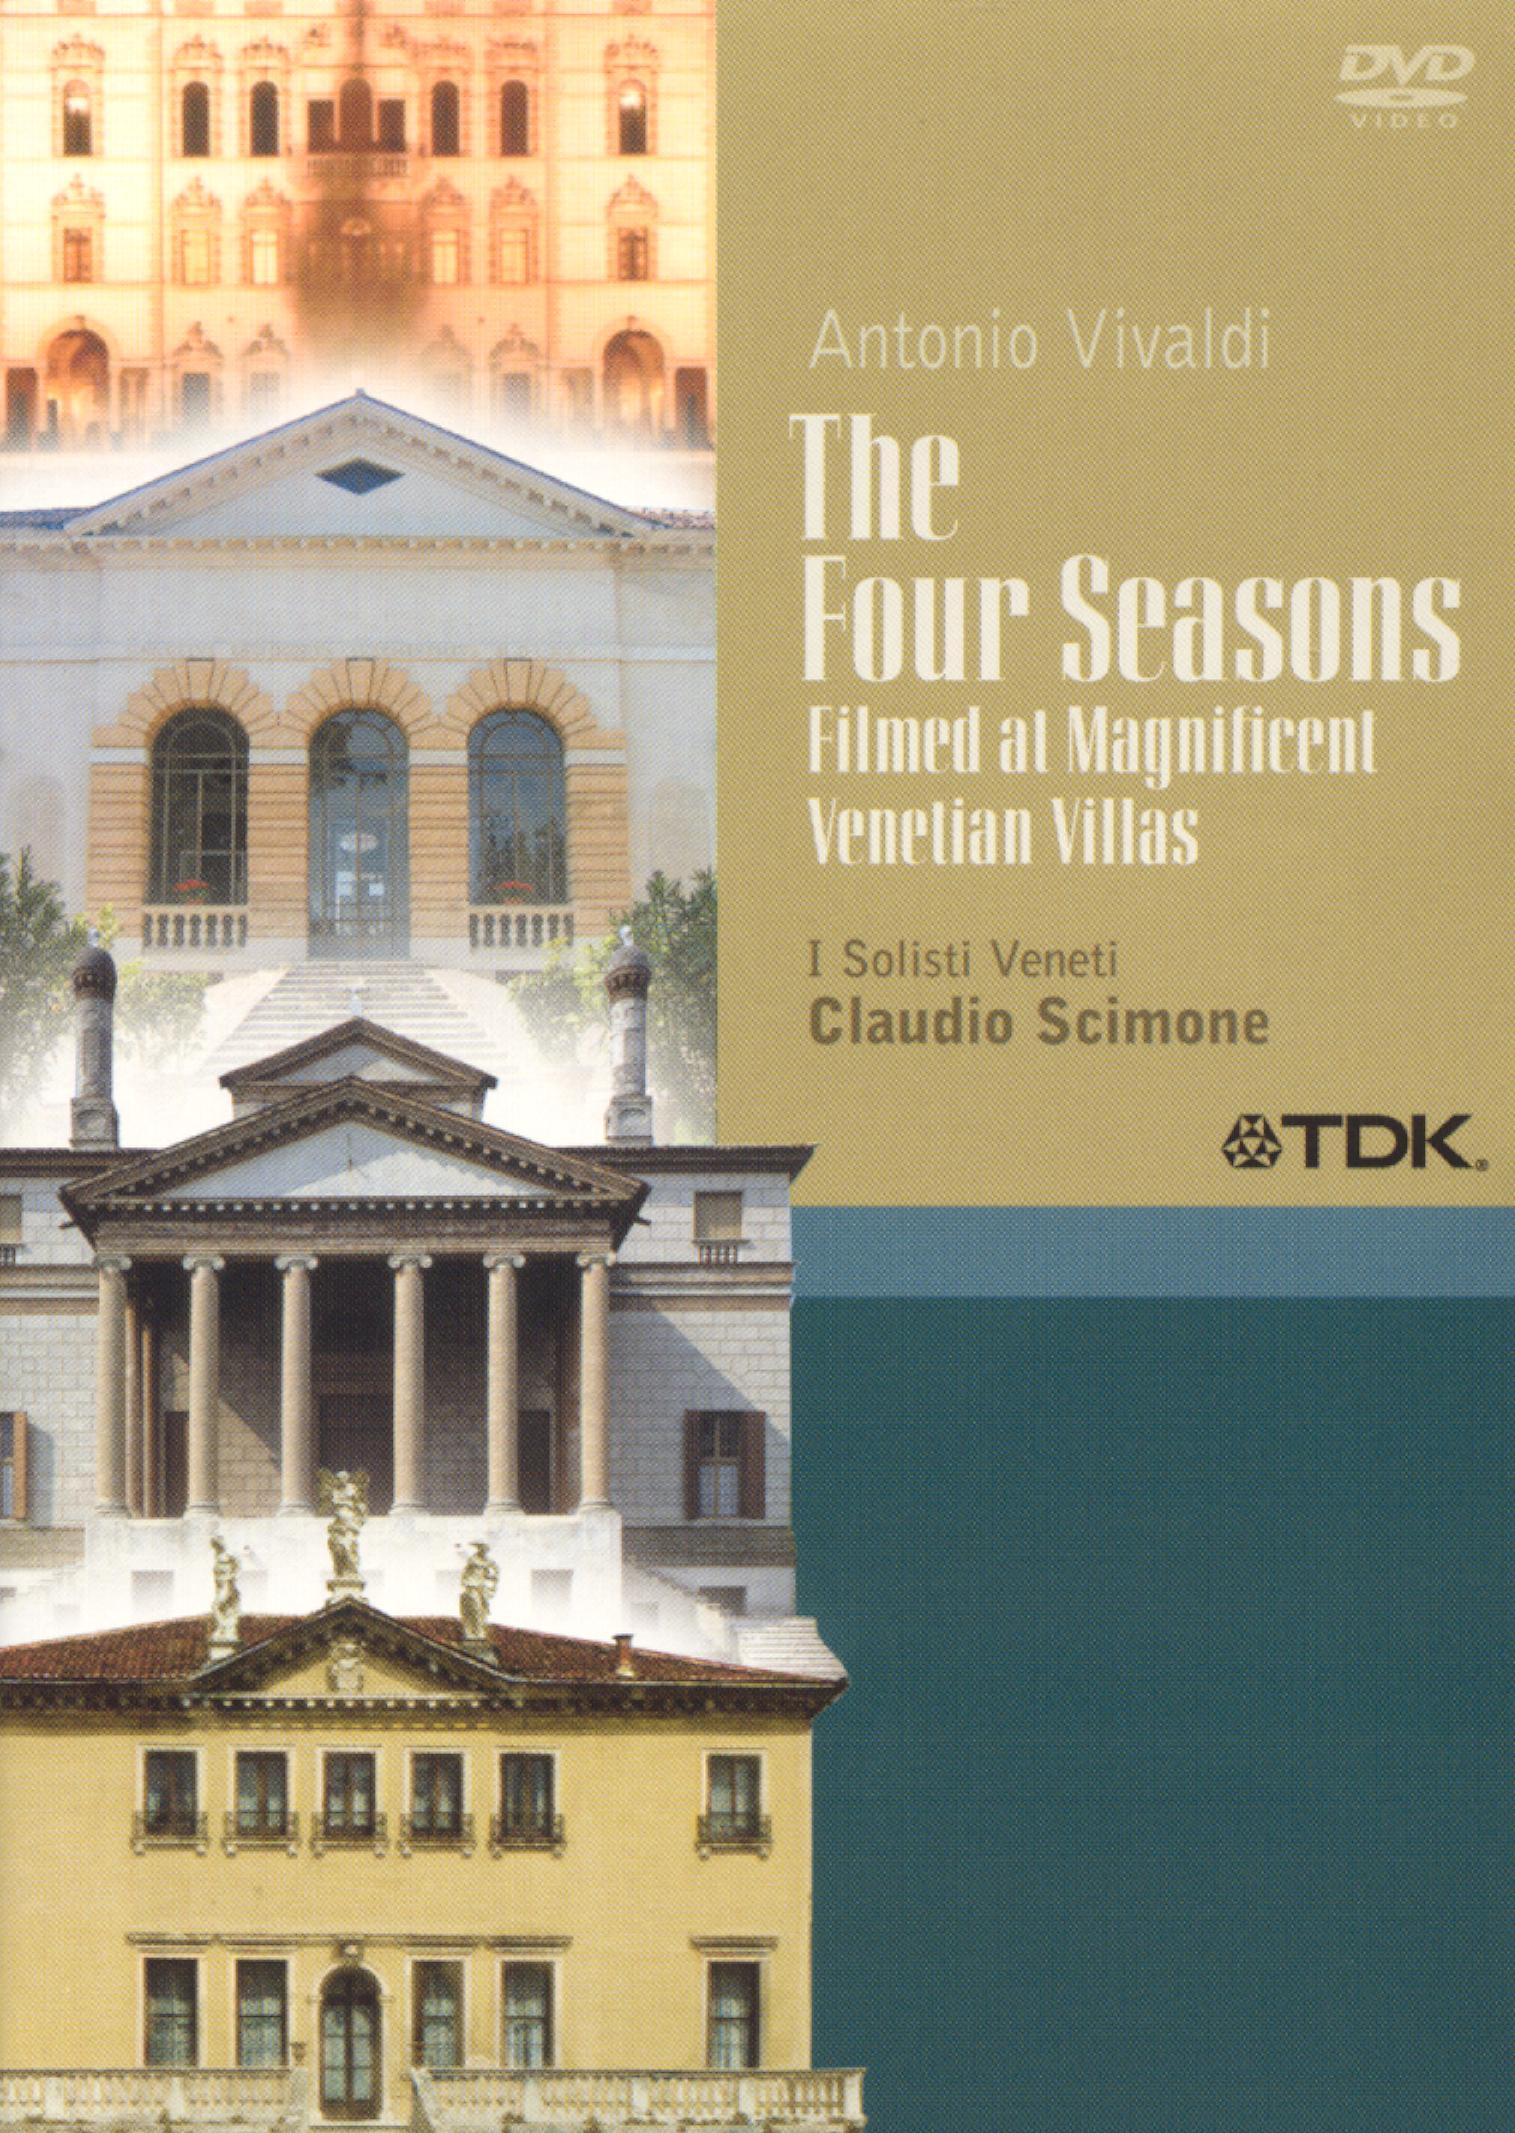 I Solisti Veneti/Claudio Scimone: The Four Seasons